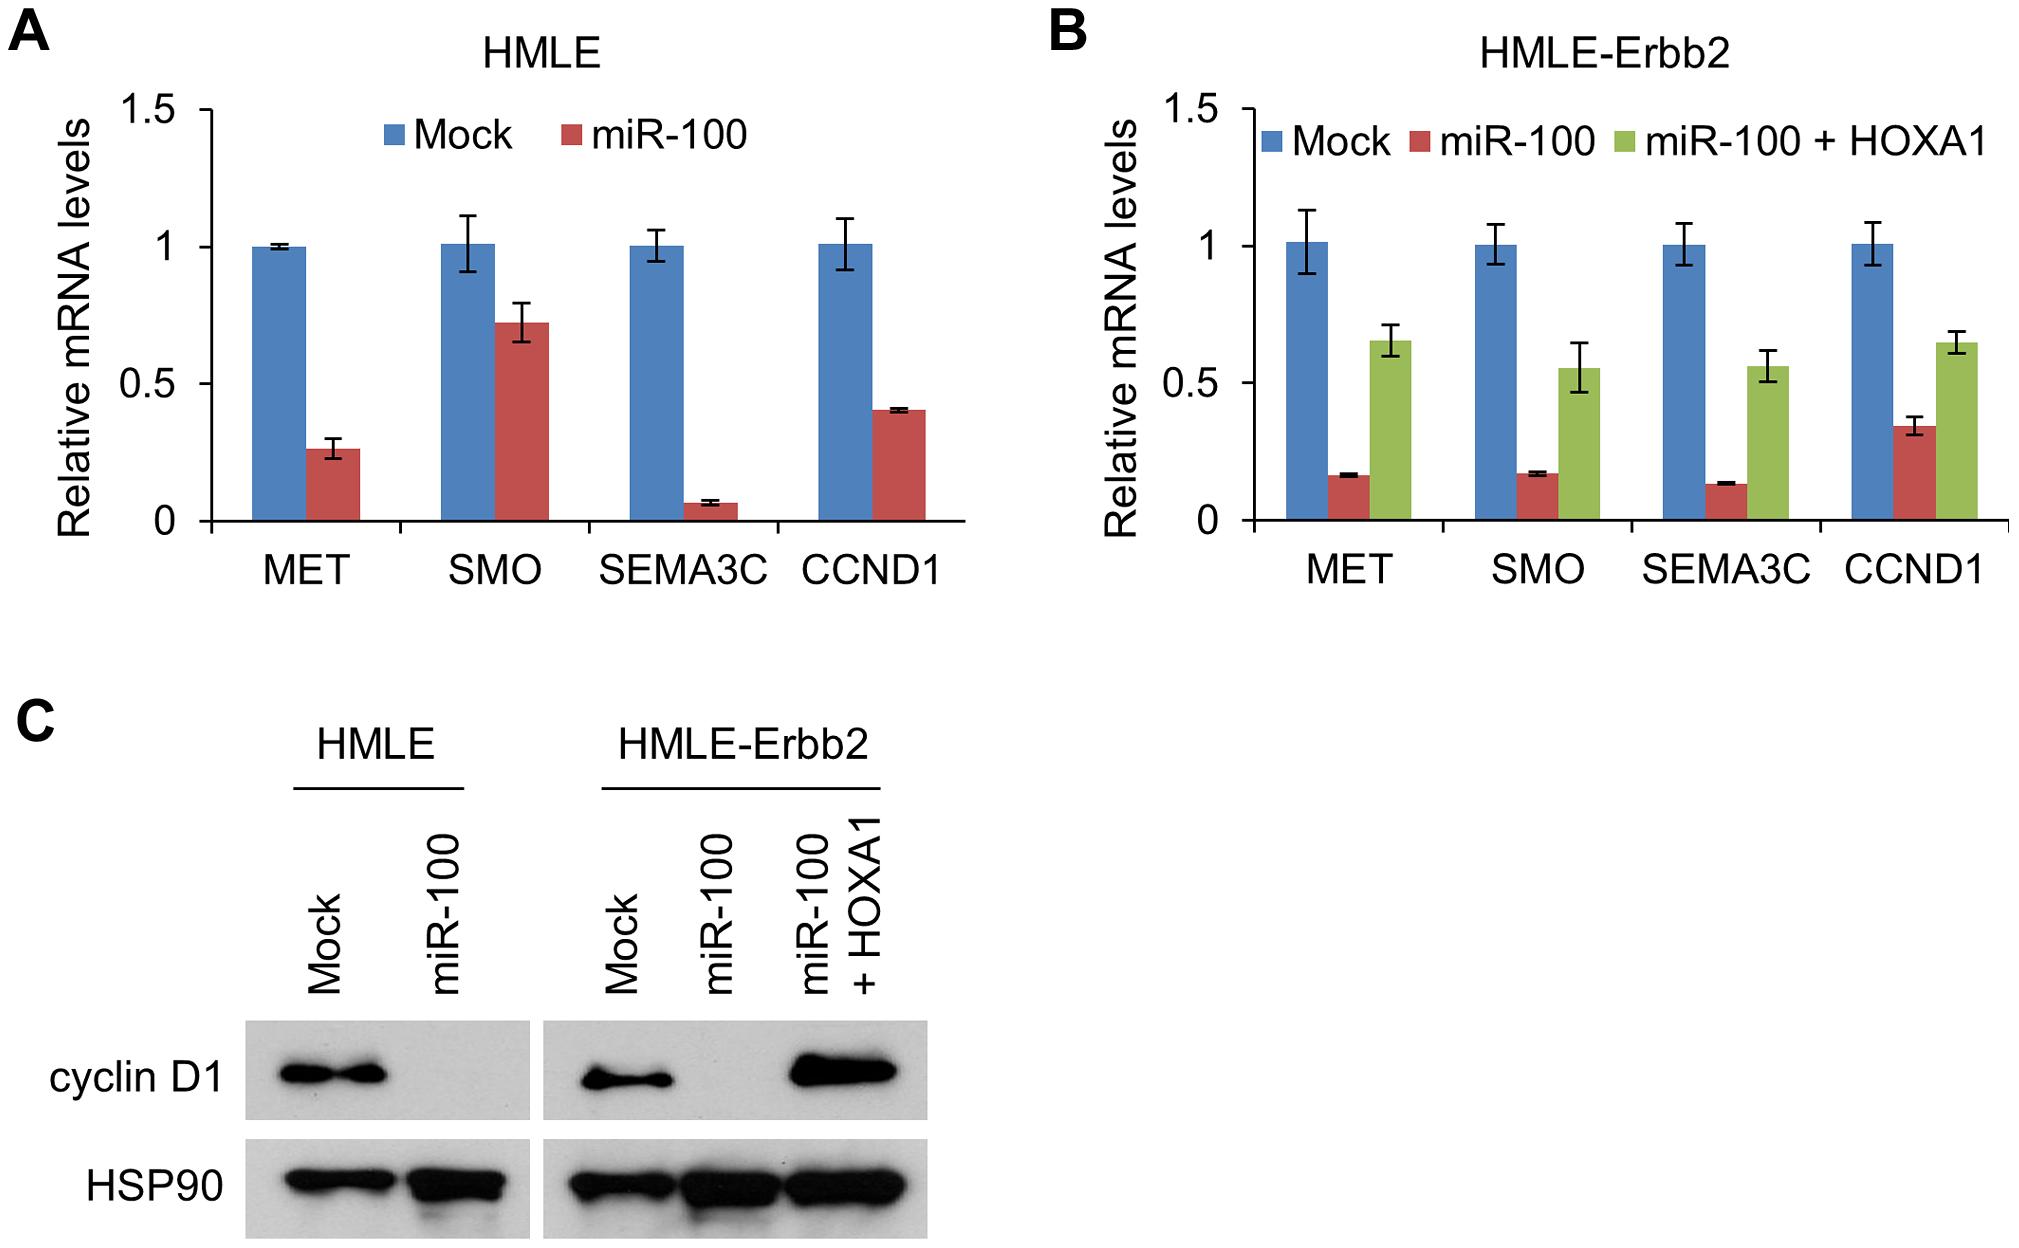 miR-100 downregulates multiple HOXA1 downstream targets involved in tumorigenesis, migration and invasion.